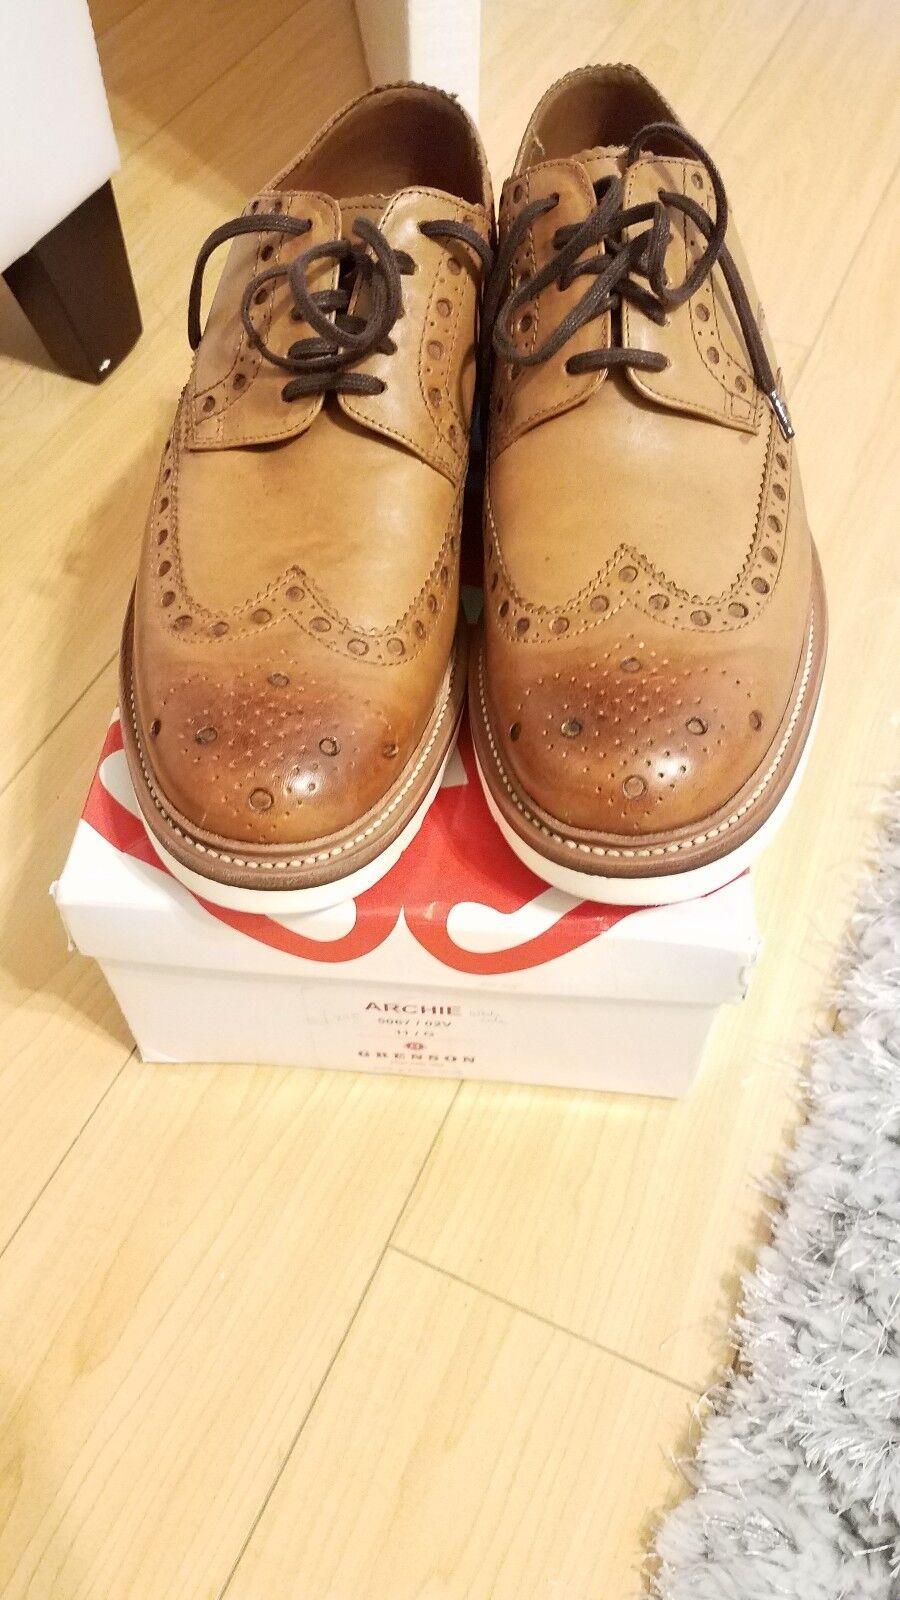 e78a35e5dc4f Men Grenson Oxford shoes size 12 12 12 leather fe636b ...